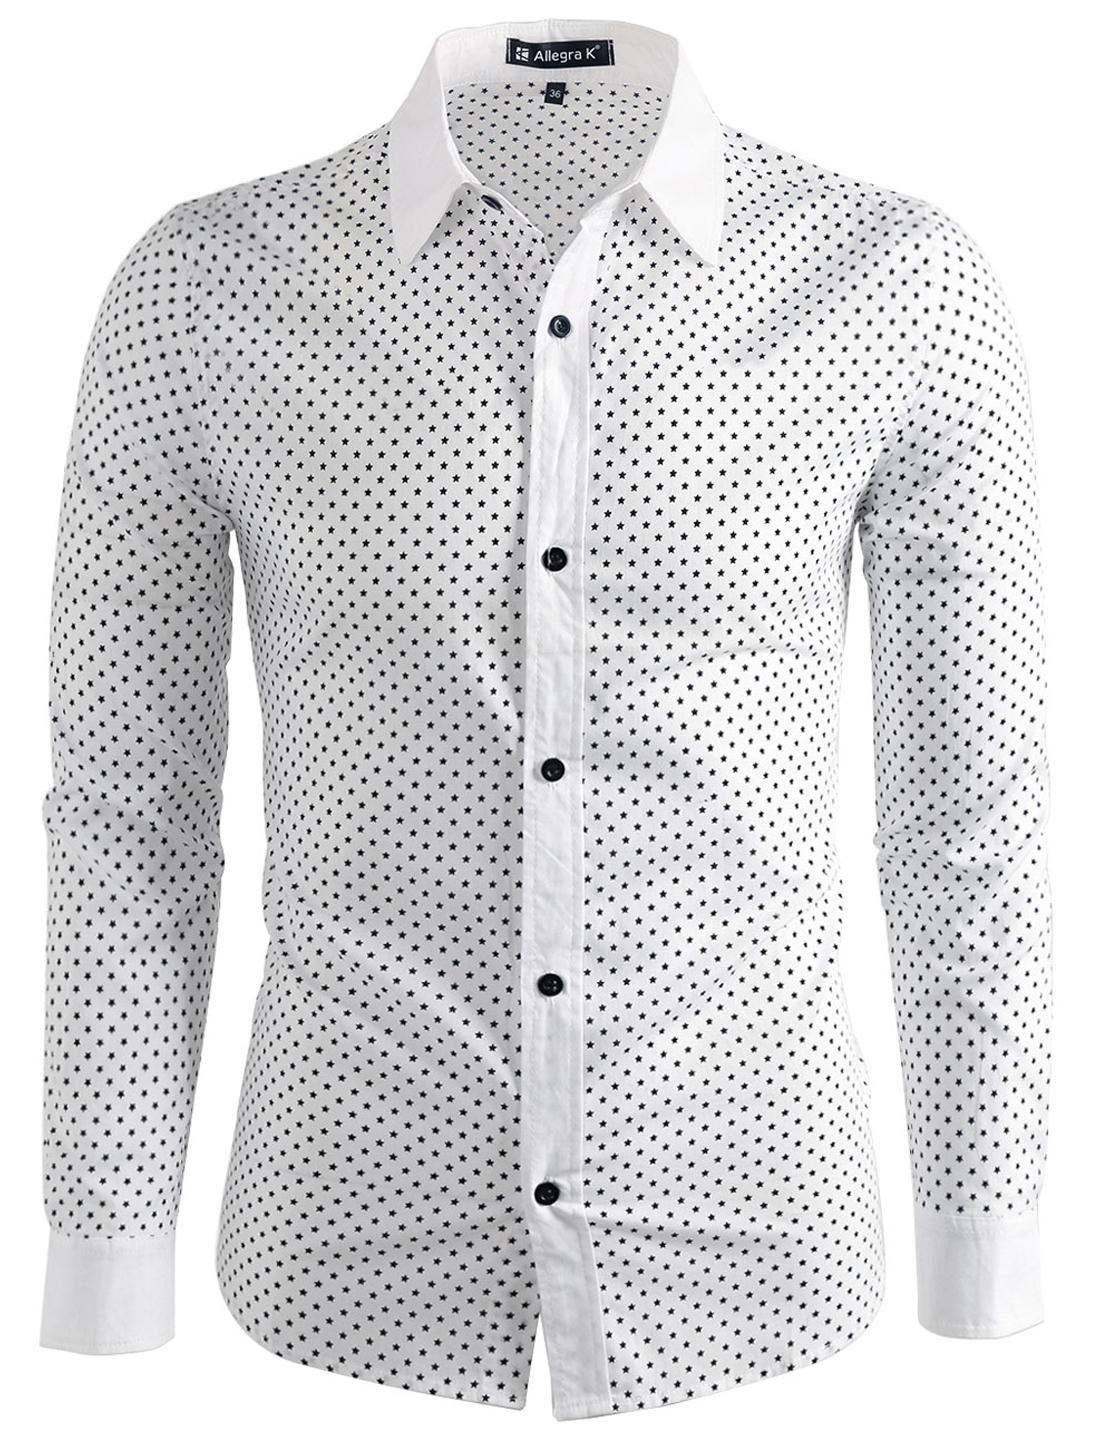 Men Stars Print Round Hem Button Down Slim Fit Long Sleeve Shirt White L